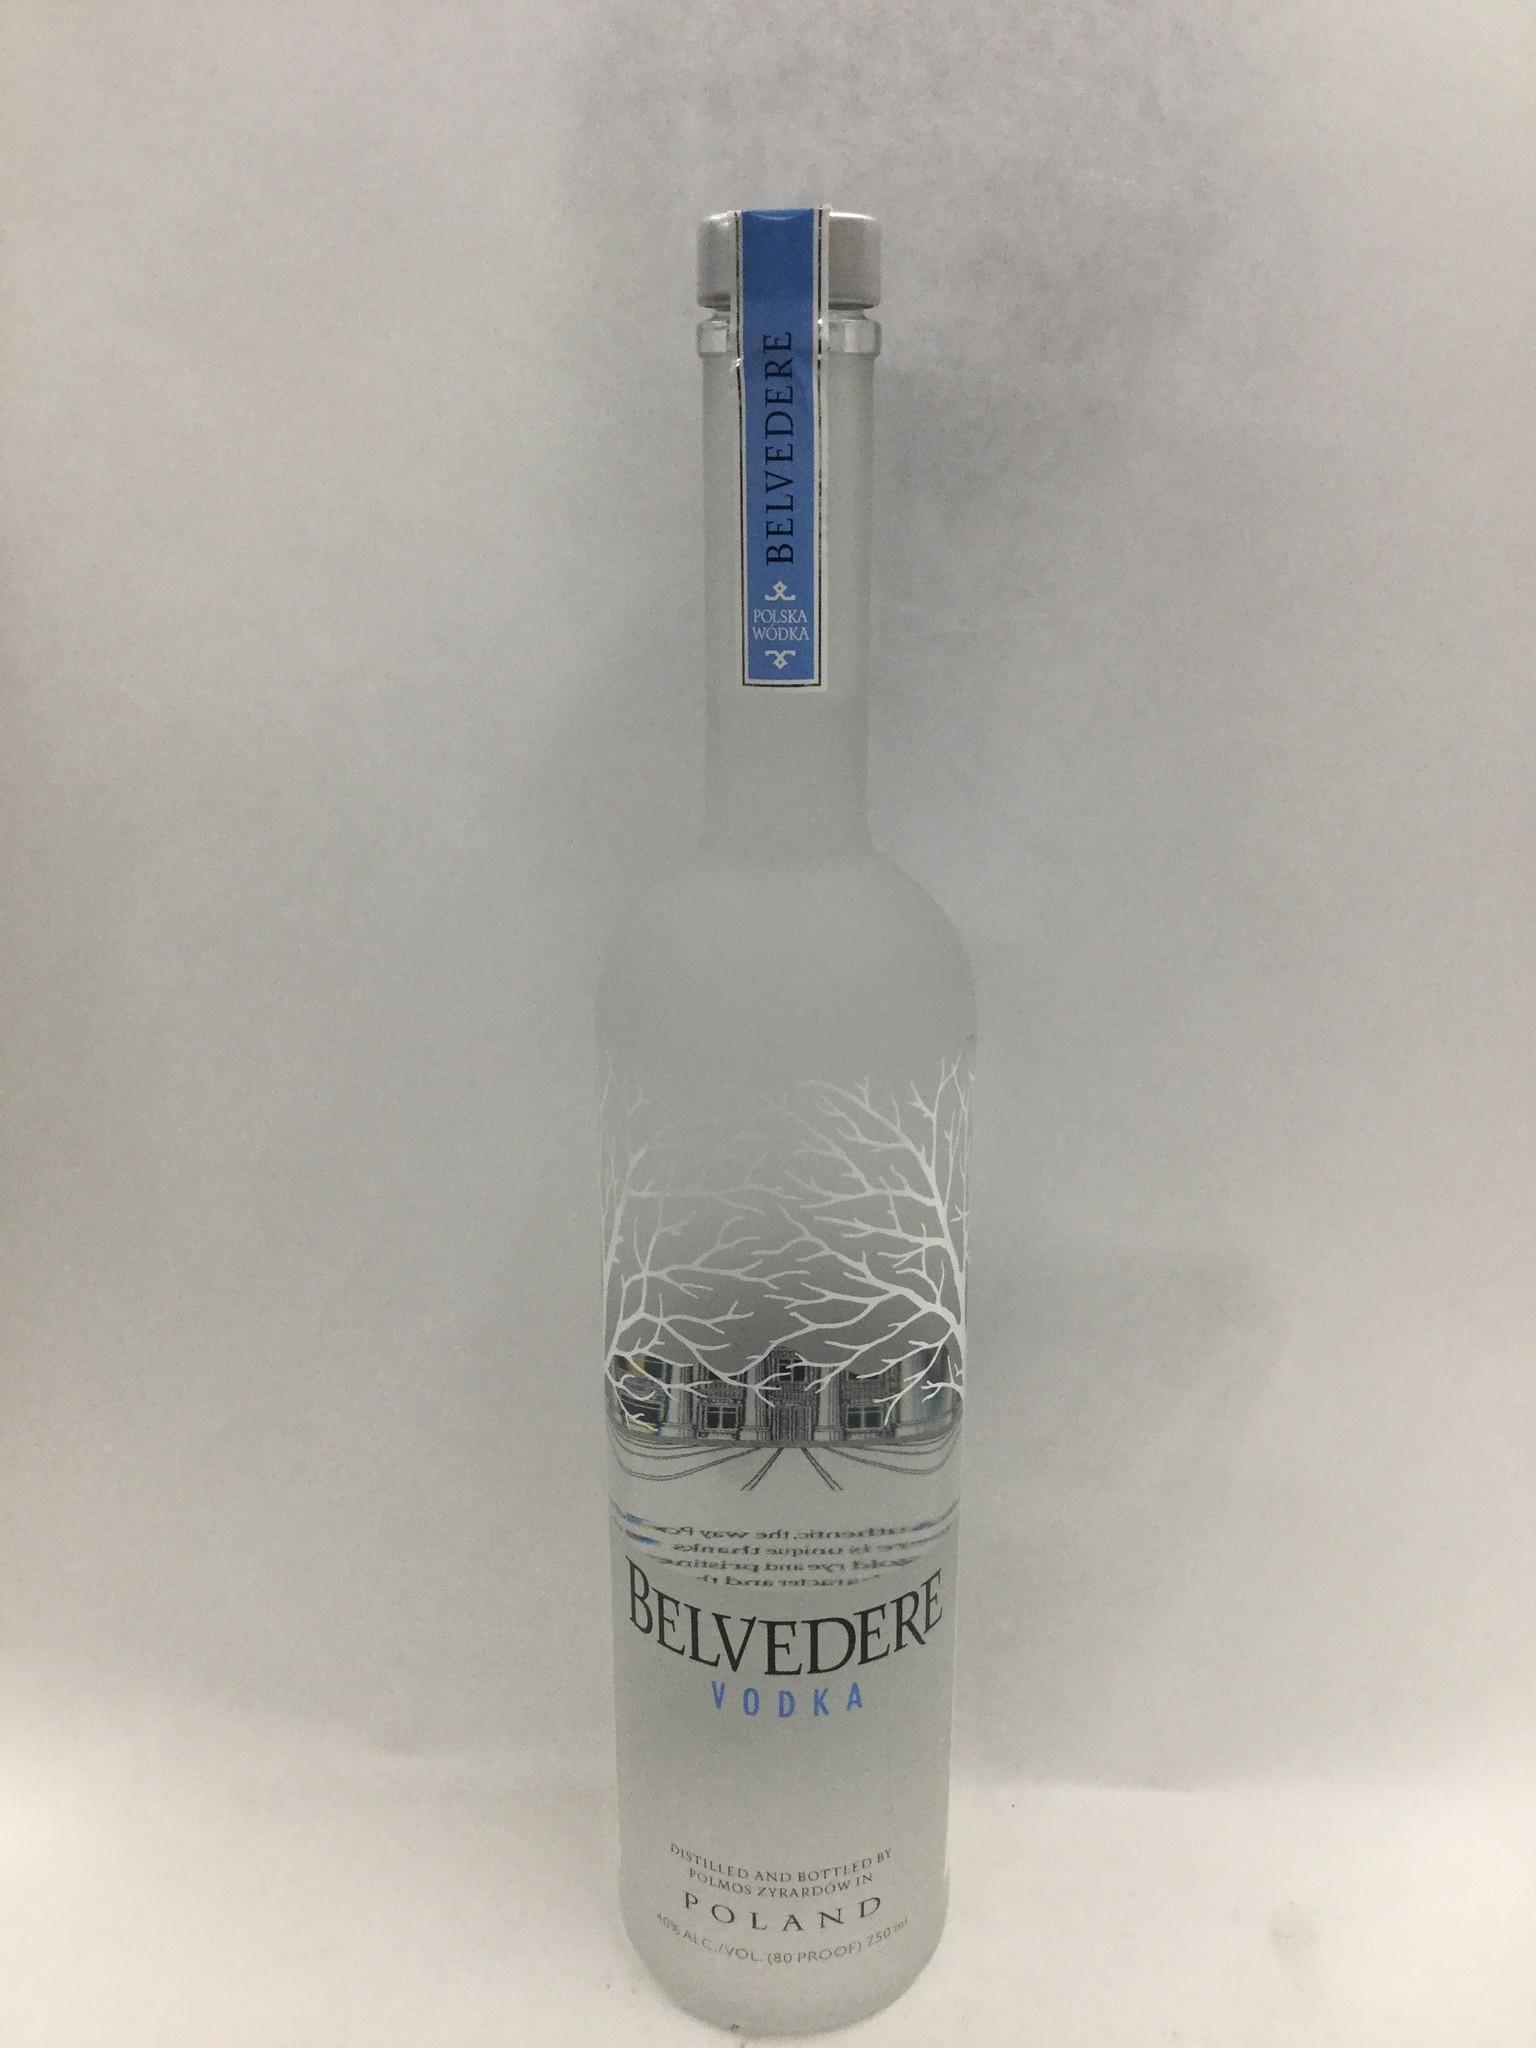 Belvedere Rye Vodka 750ml